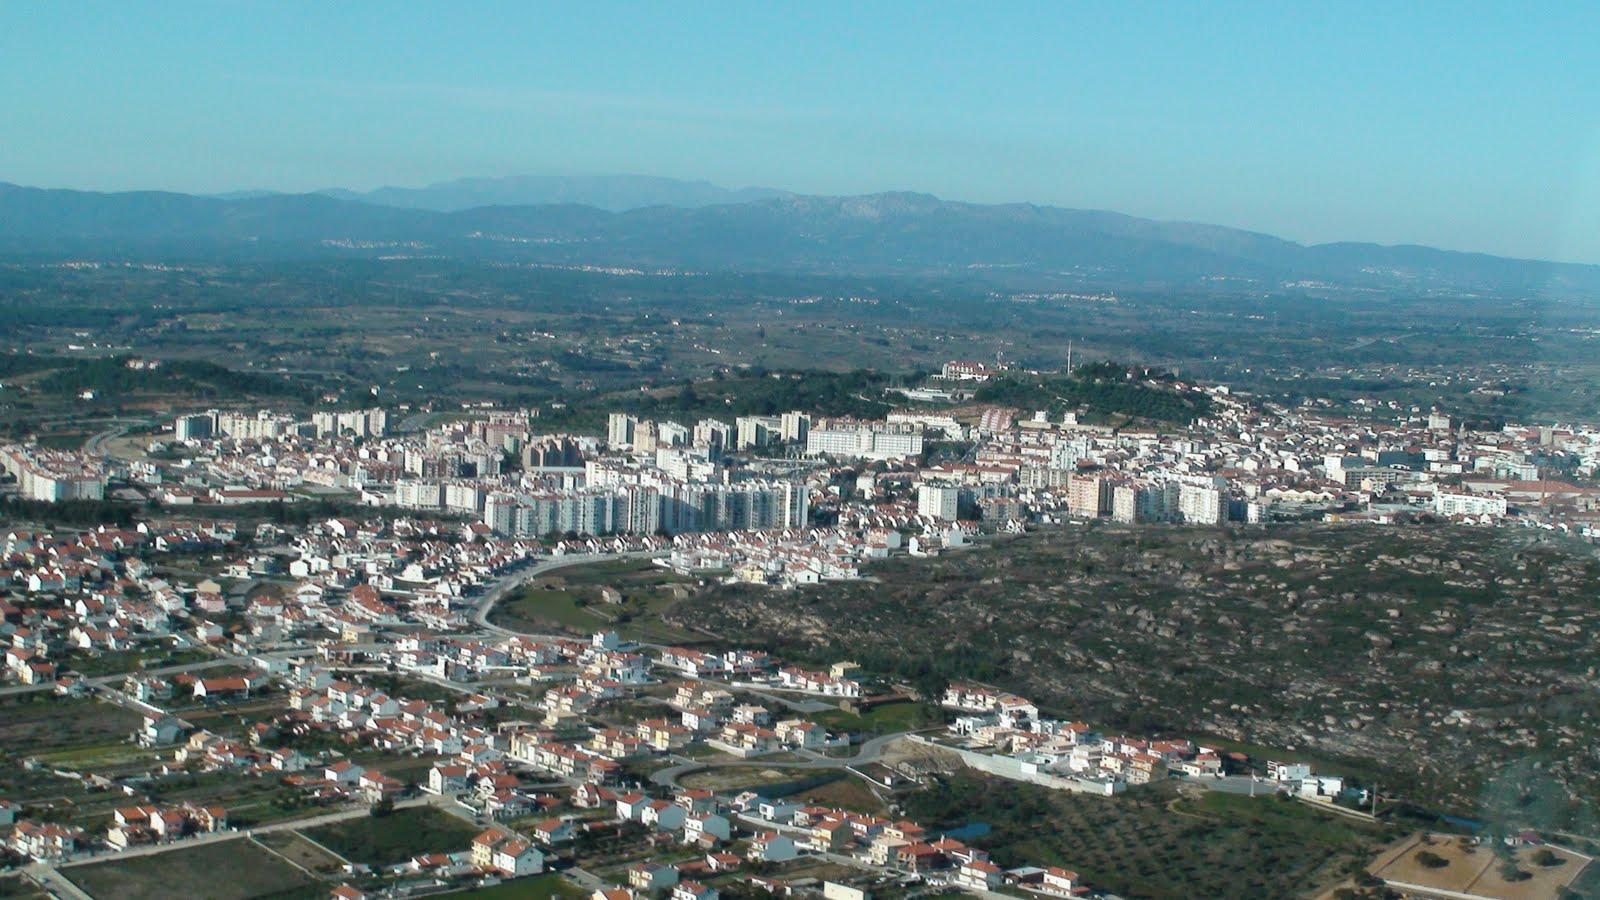 Castelo Branco Portugal  city photos gallery : Castelo Branco mais próximo ...